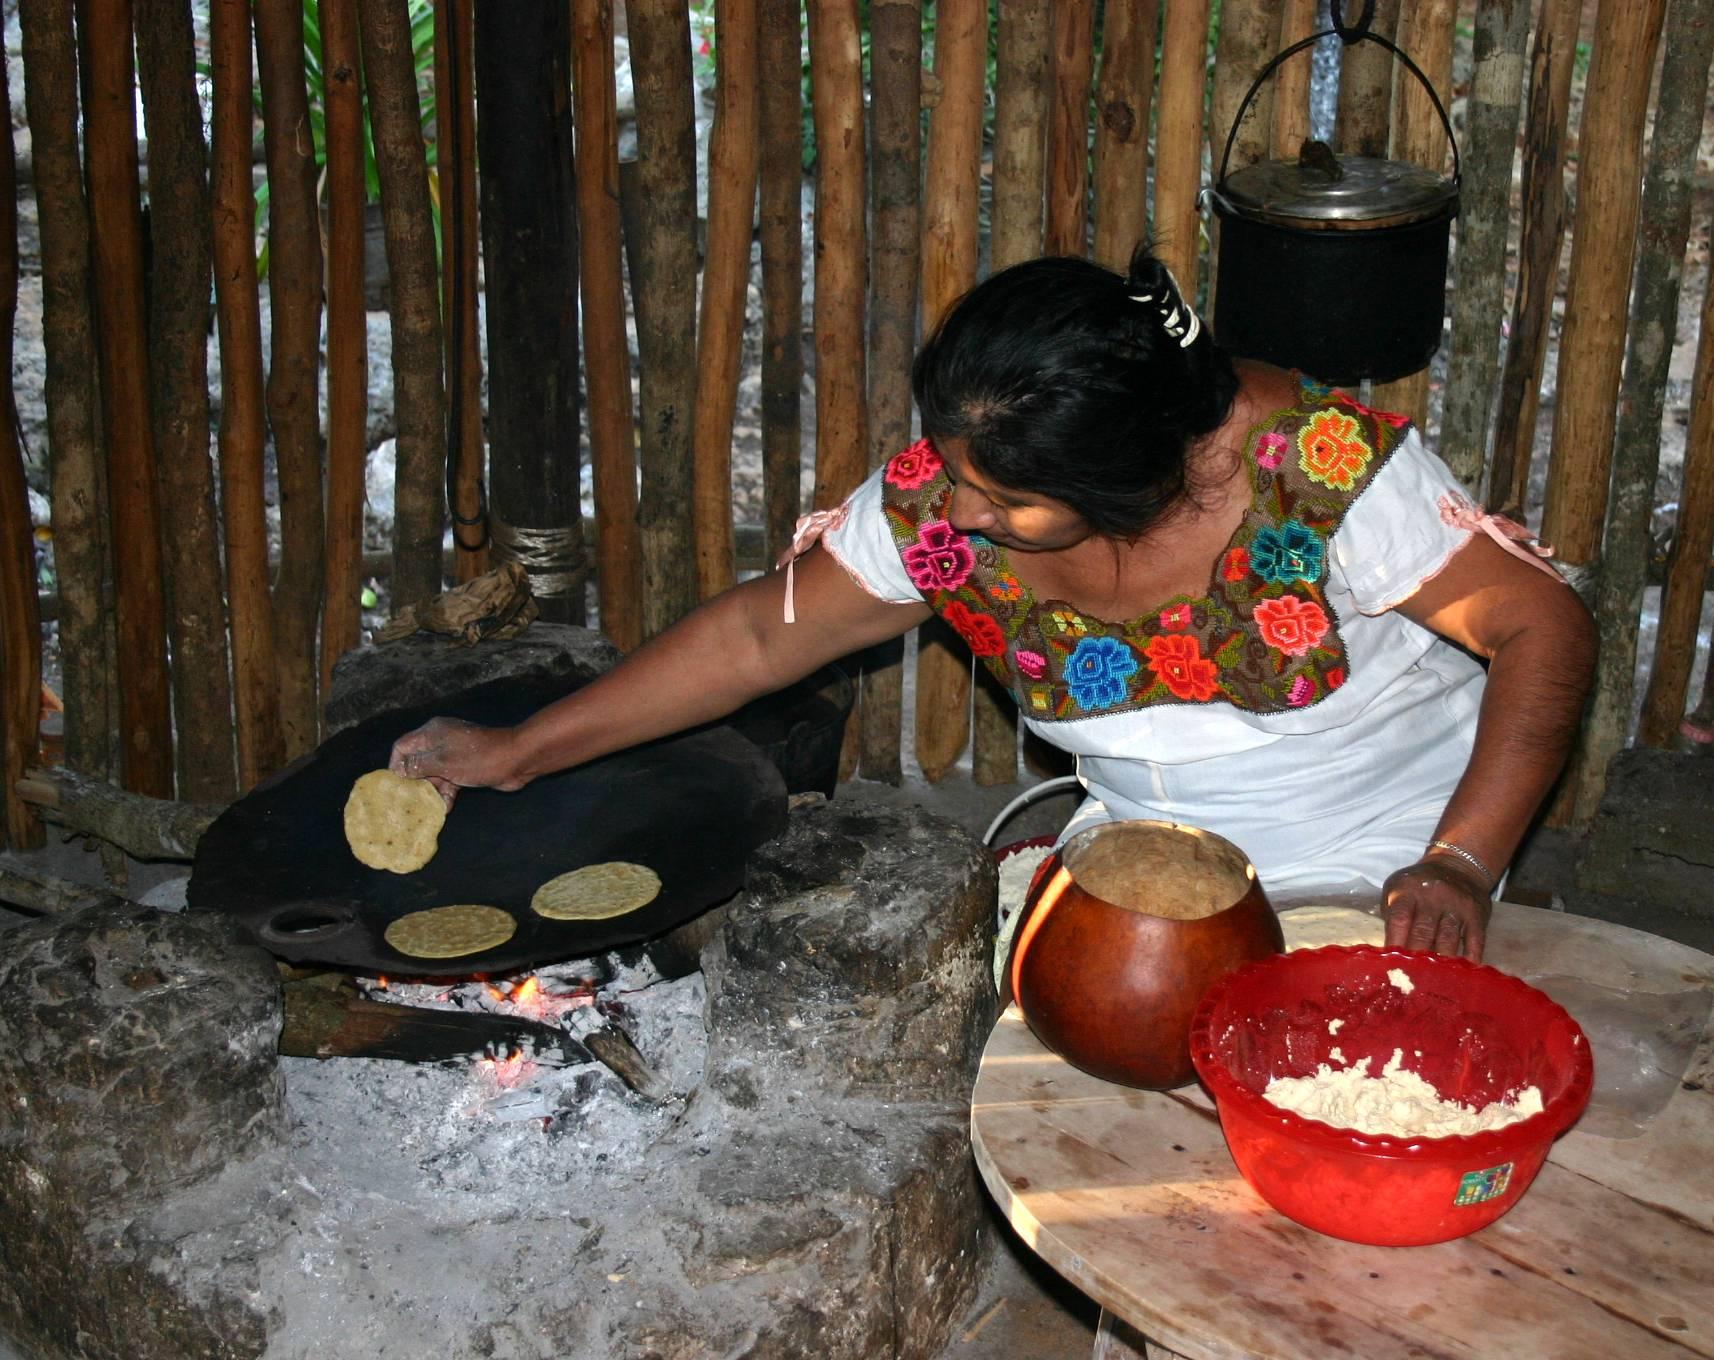 Mexican woman preparing tortillas